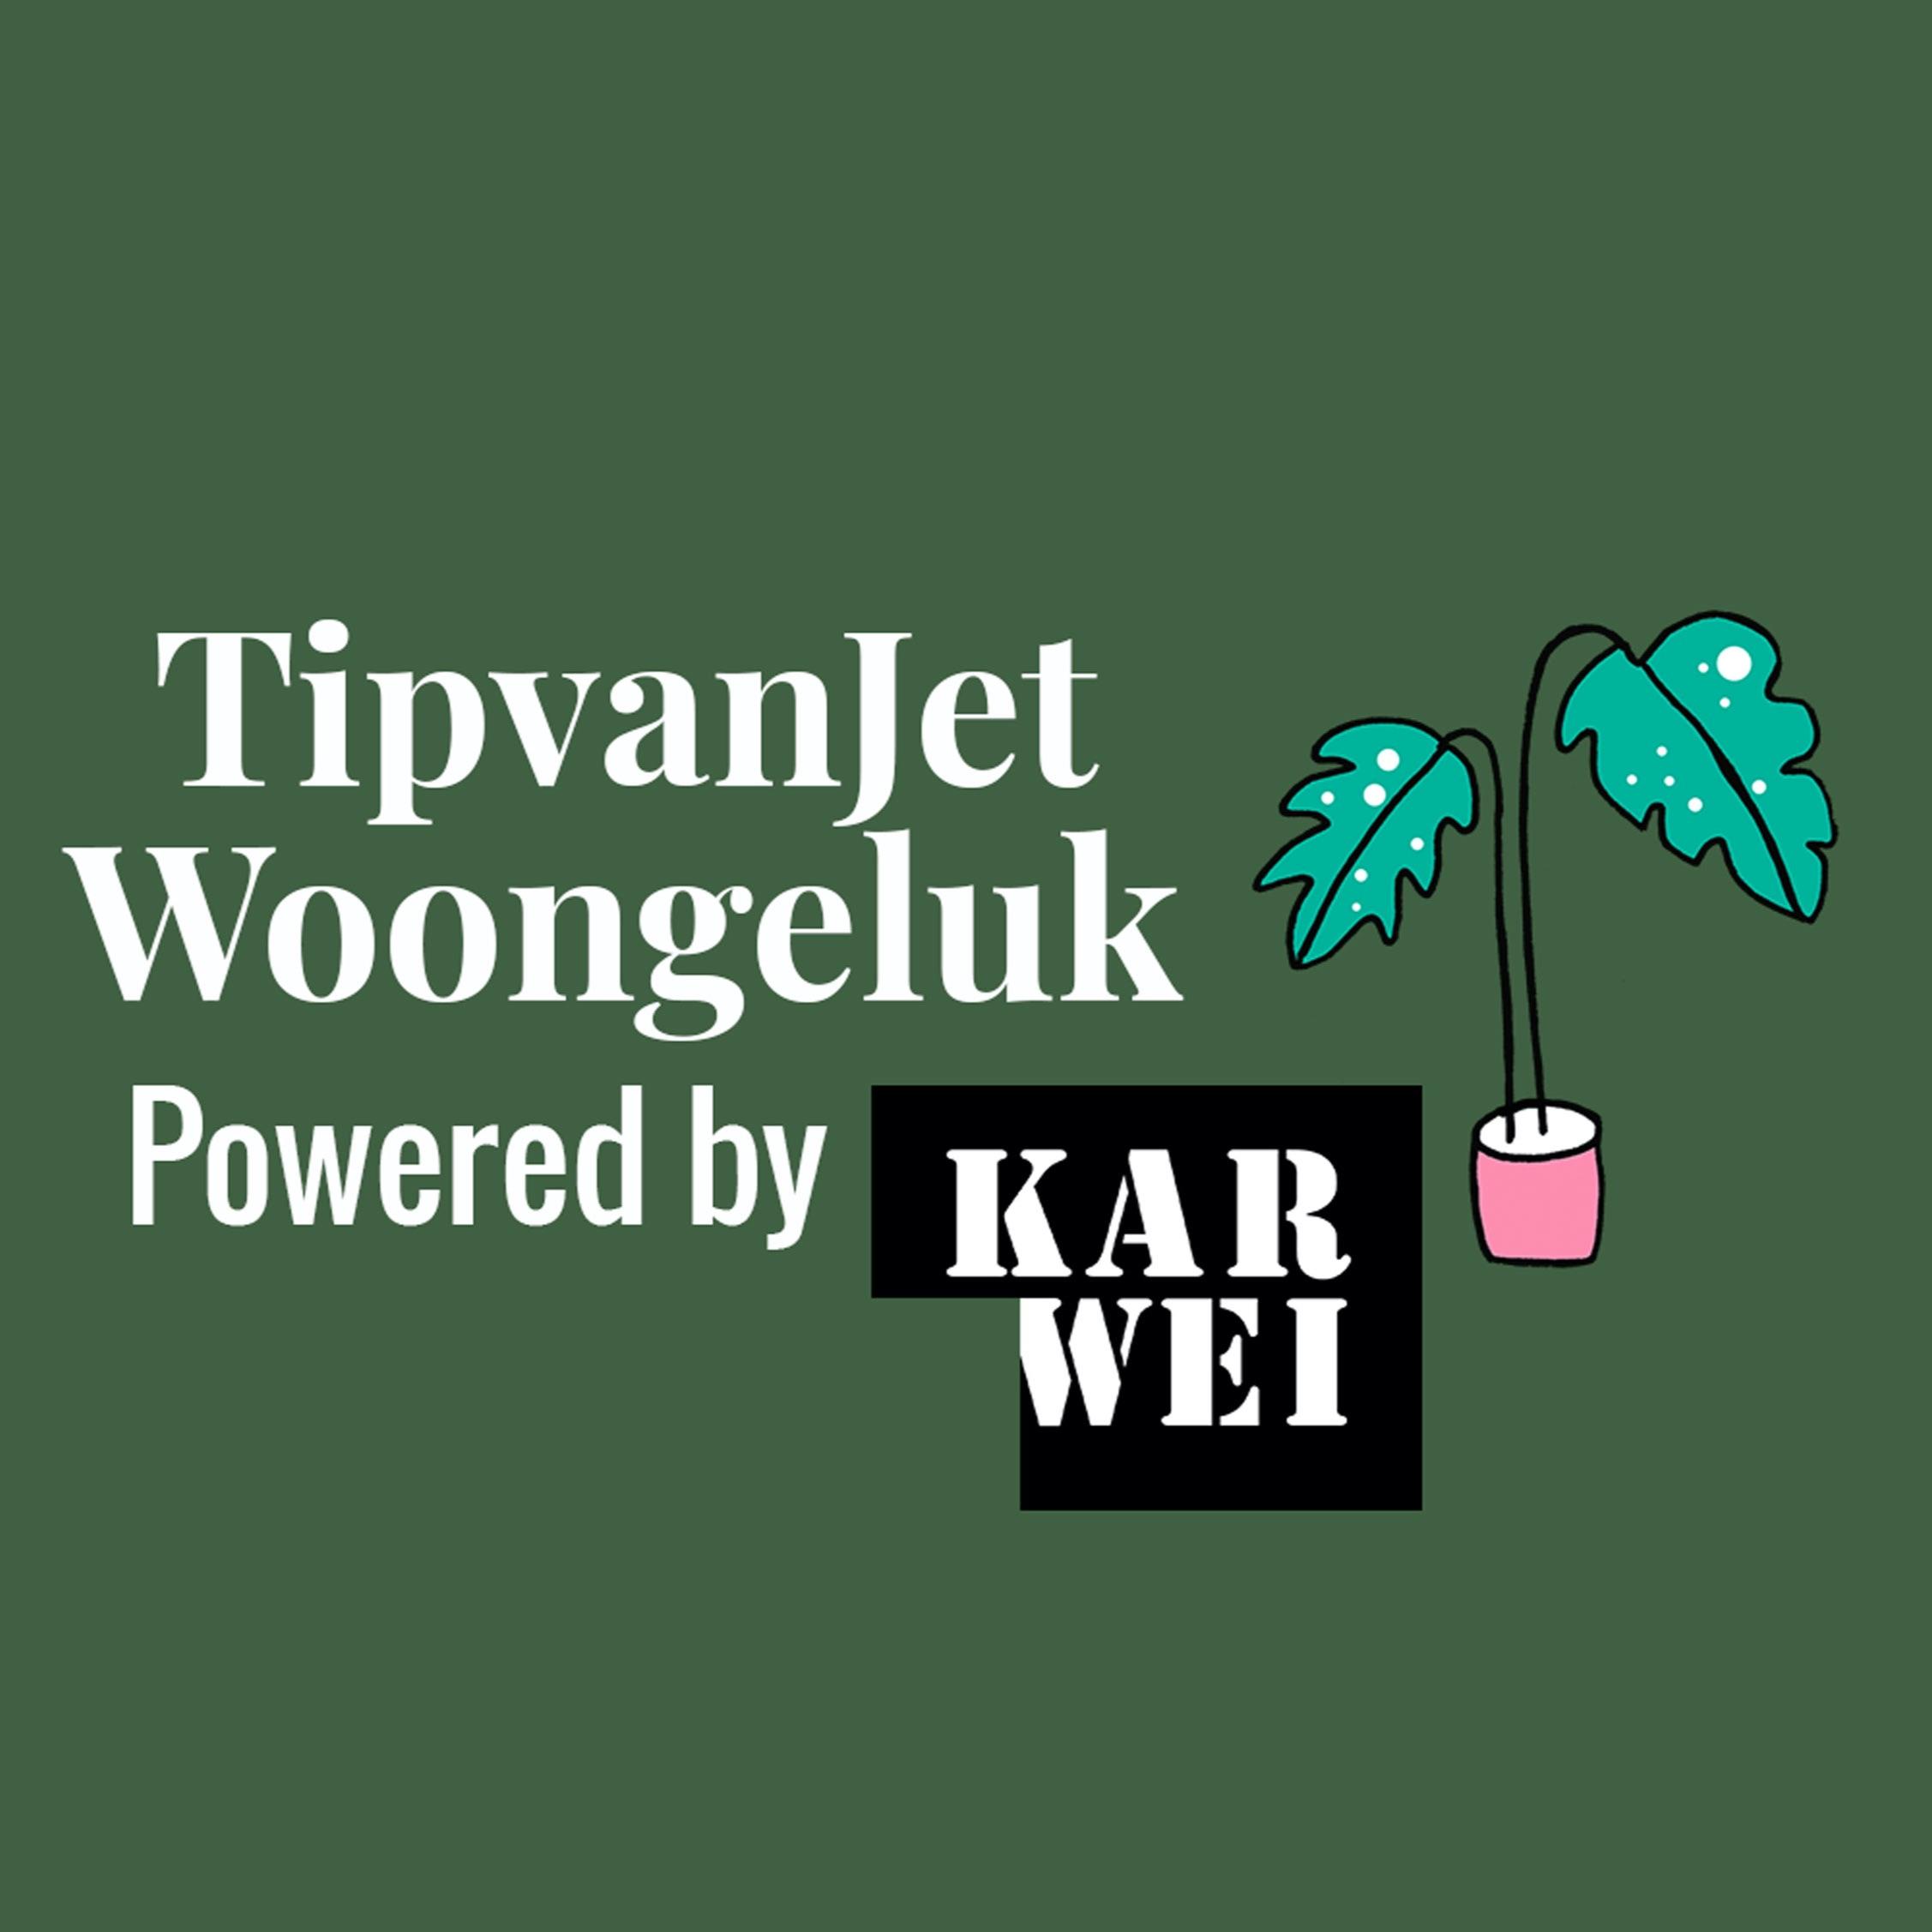 TipvanJet Woongeluk Podcast logo